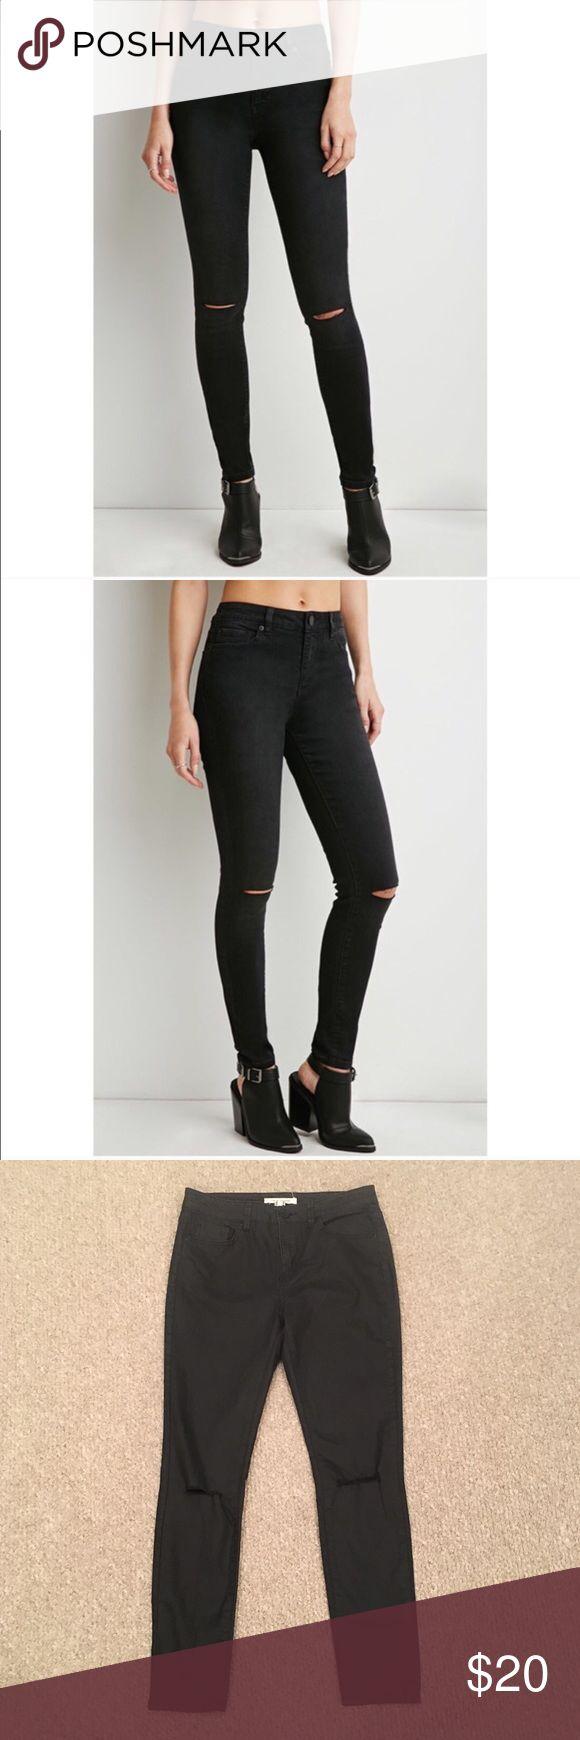 "Life in Progress Black Knee Hole Pants 27"" inseam Forever 21 Pants Skinny"